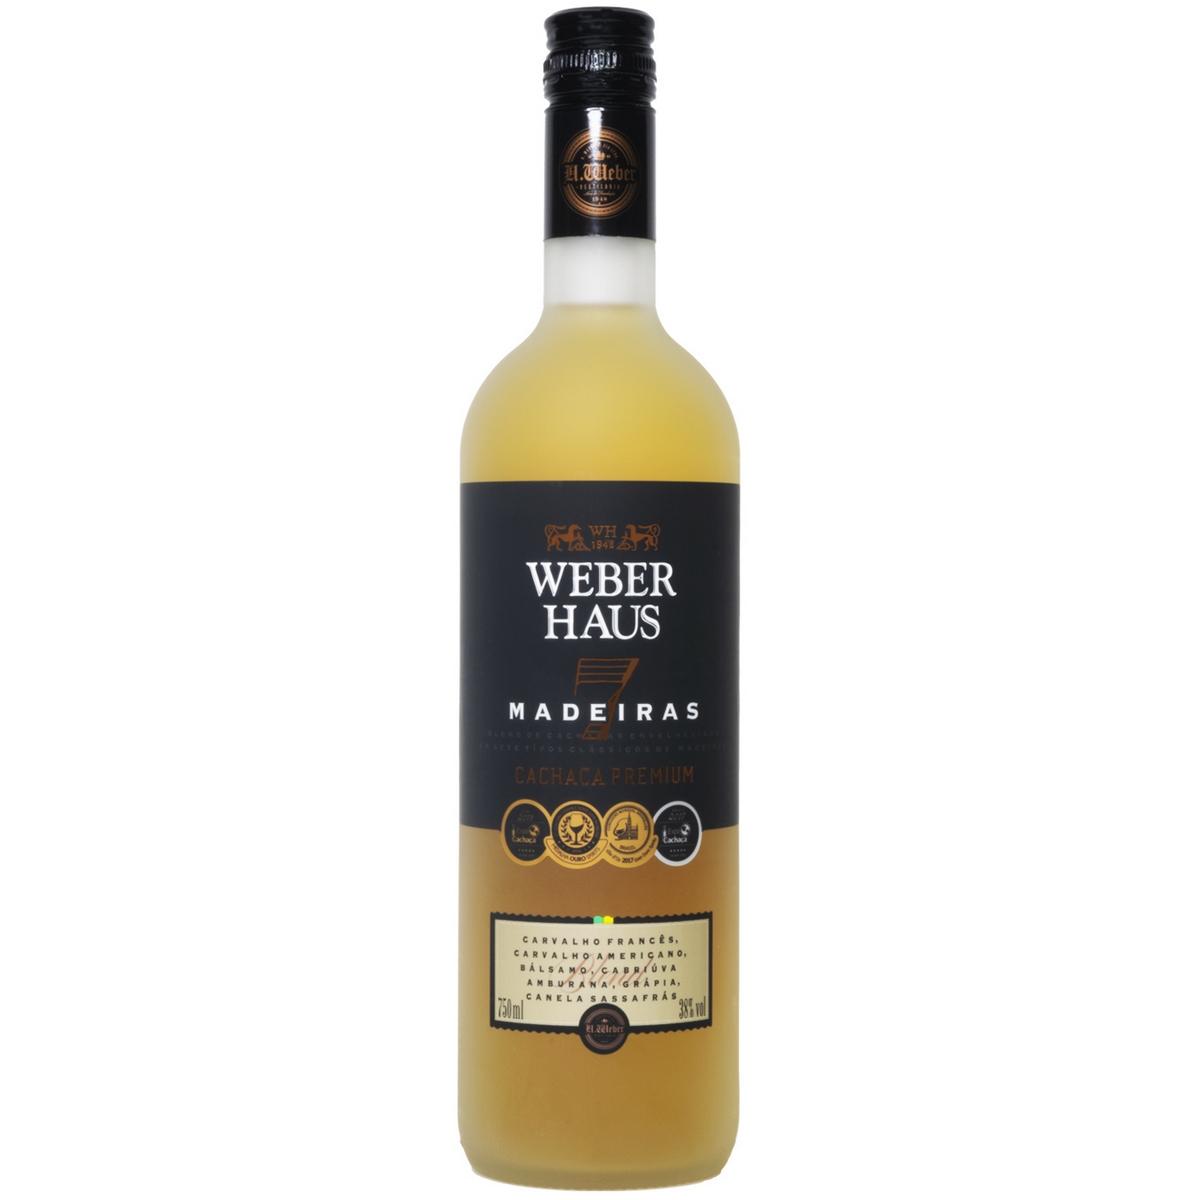 Cachaça Weber Haus Premium 7 Madeiras 750ml